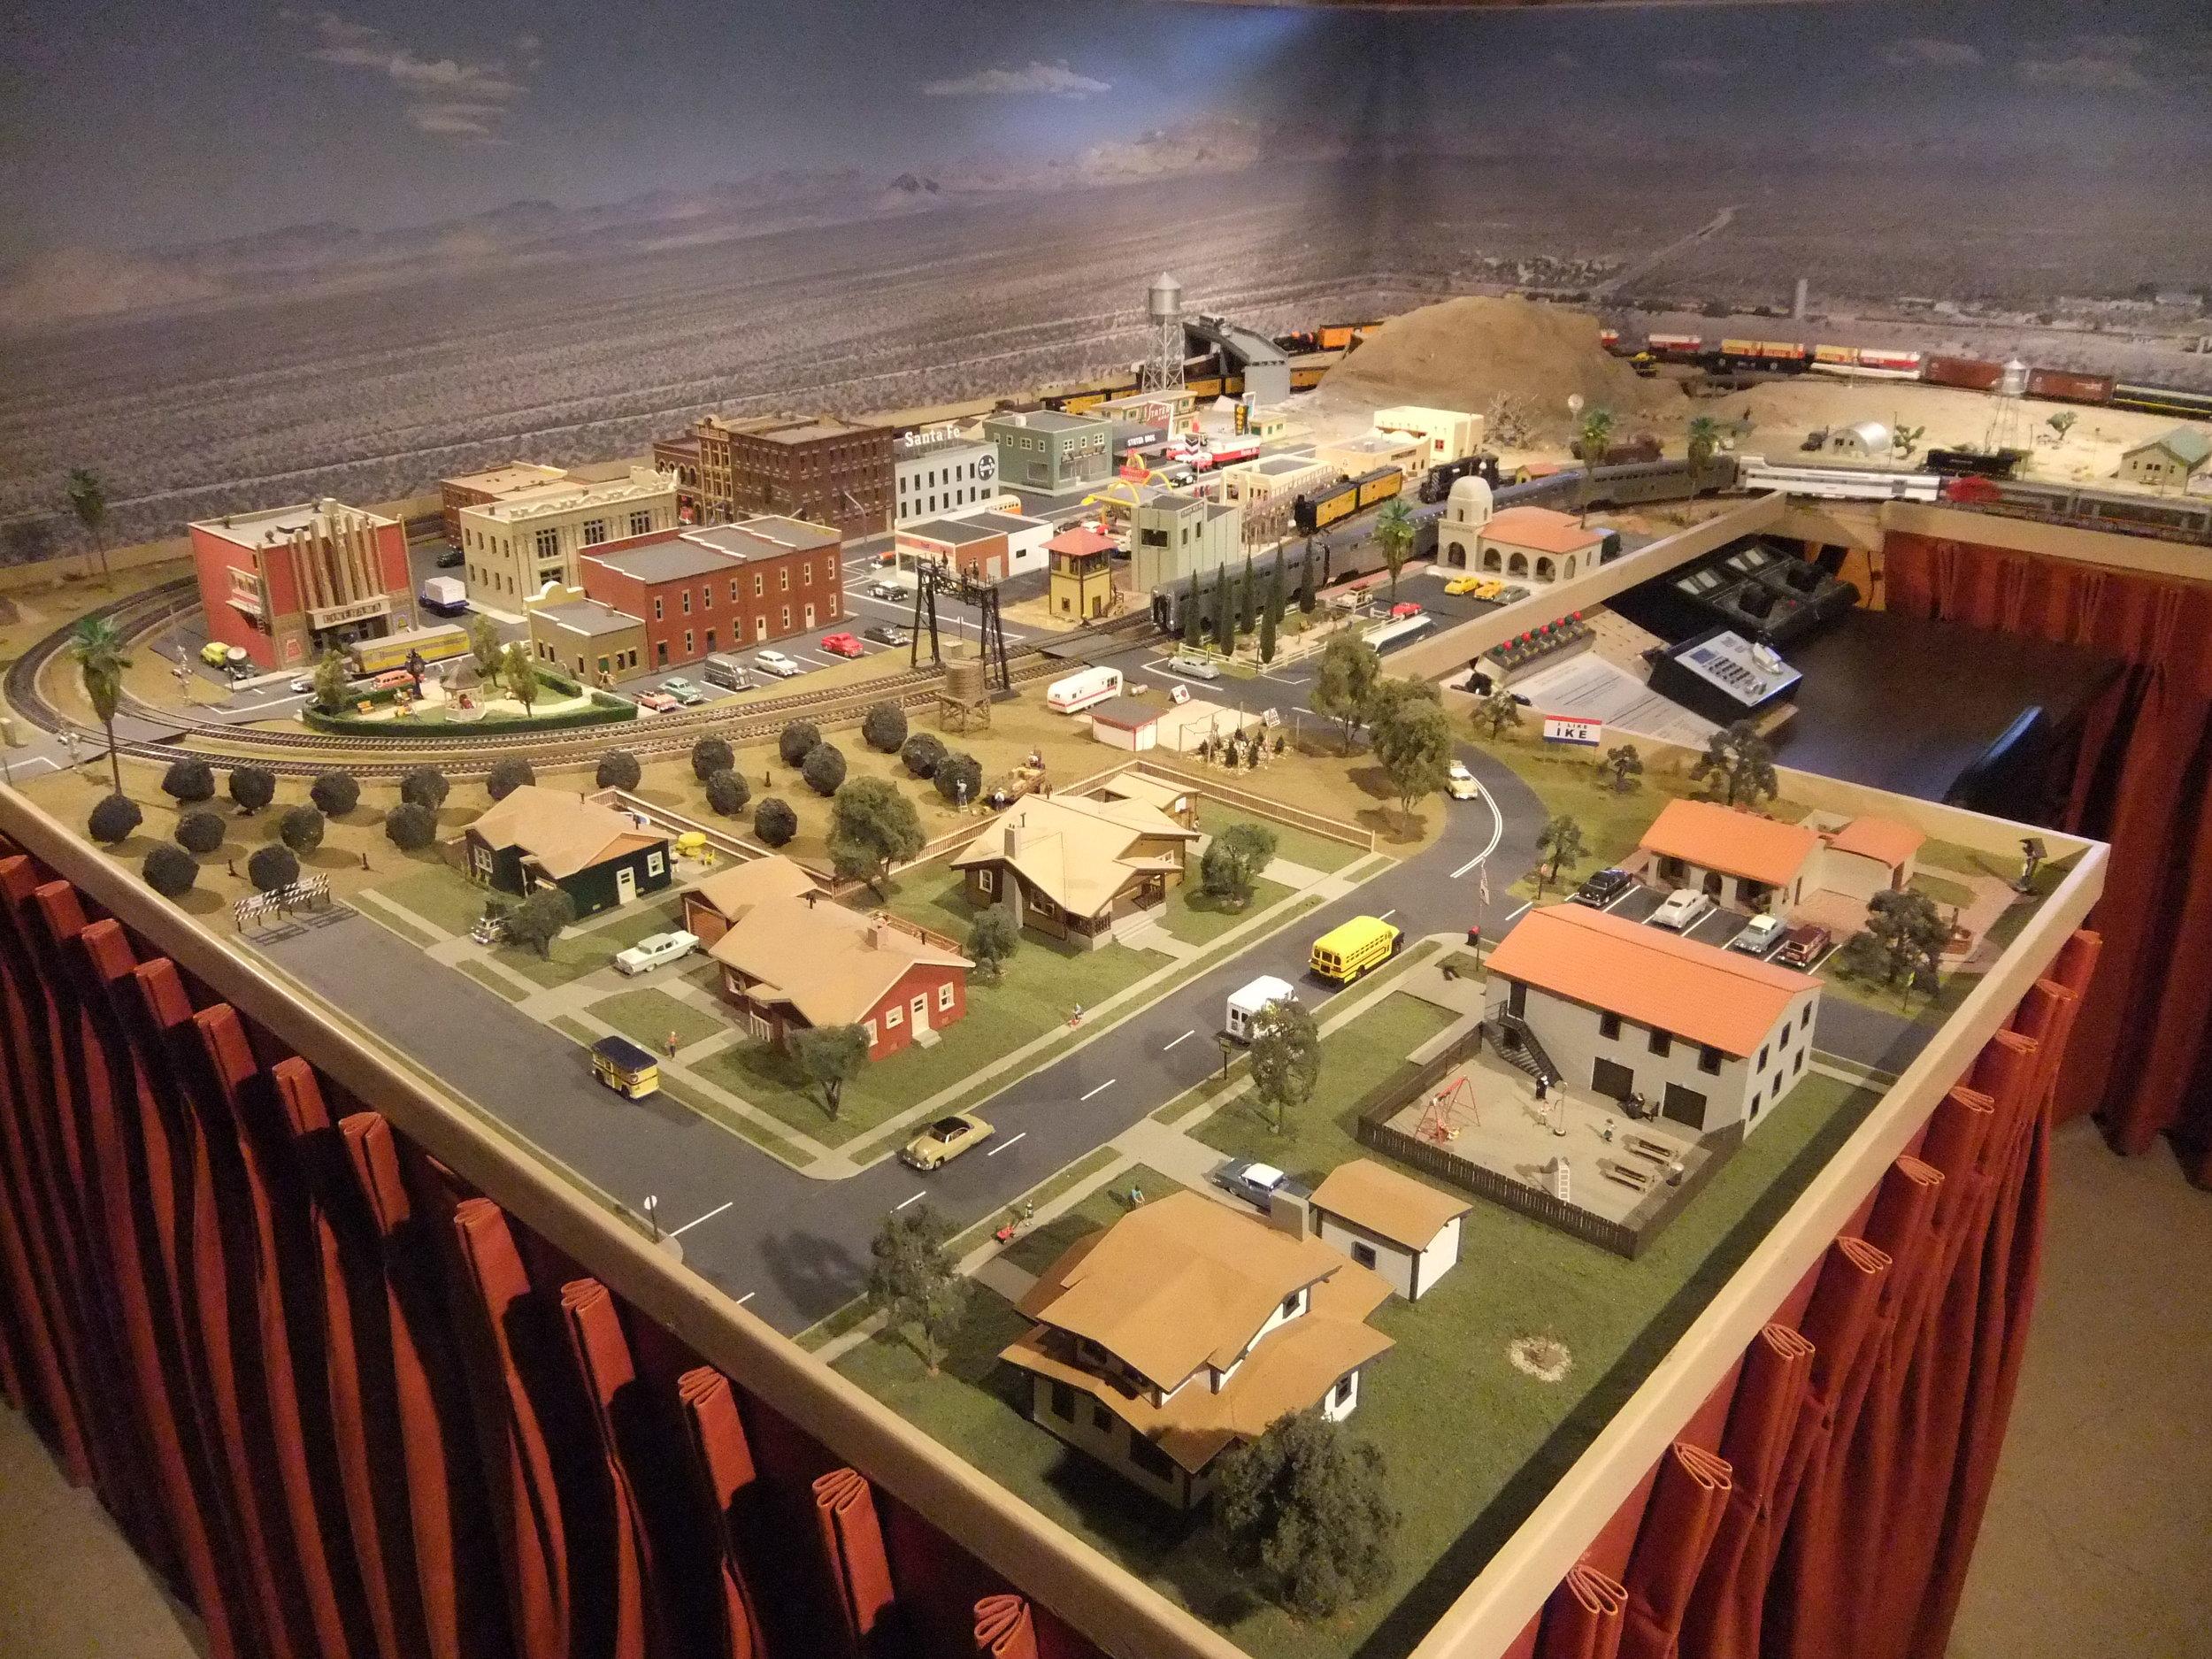 ho_layout_overview__corner_1__by_southwestchief-d62ux9m.jpg